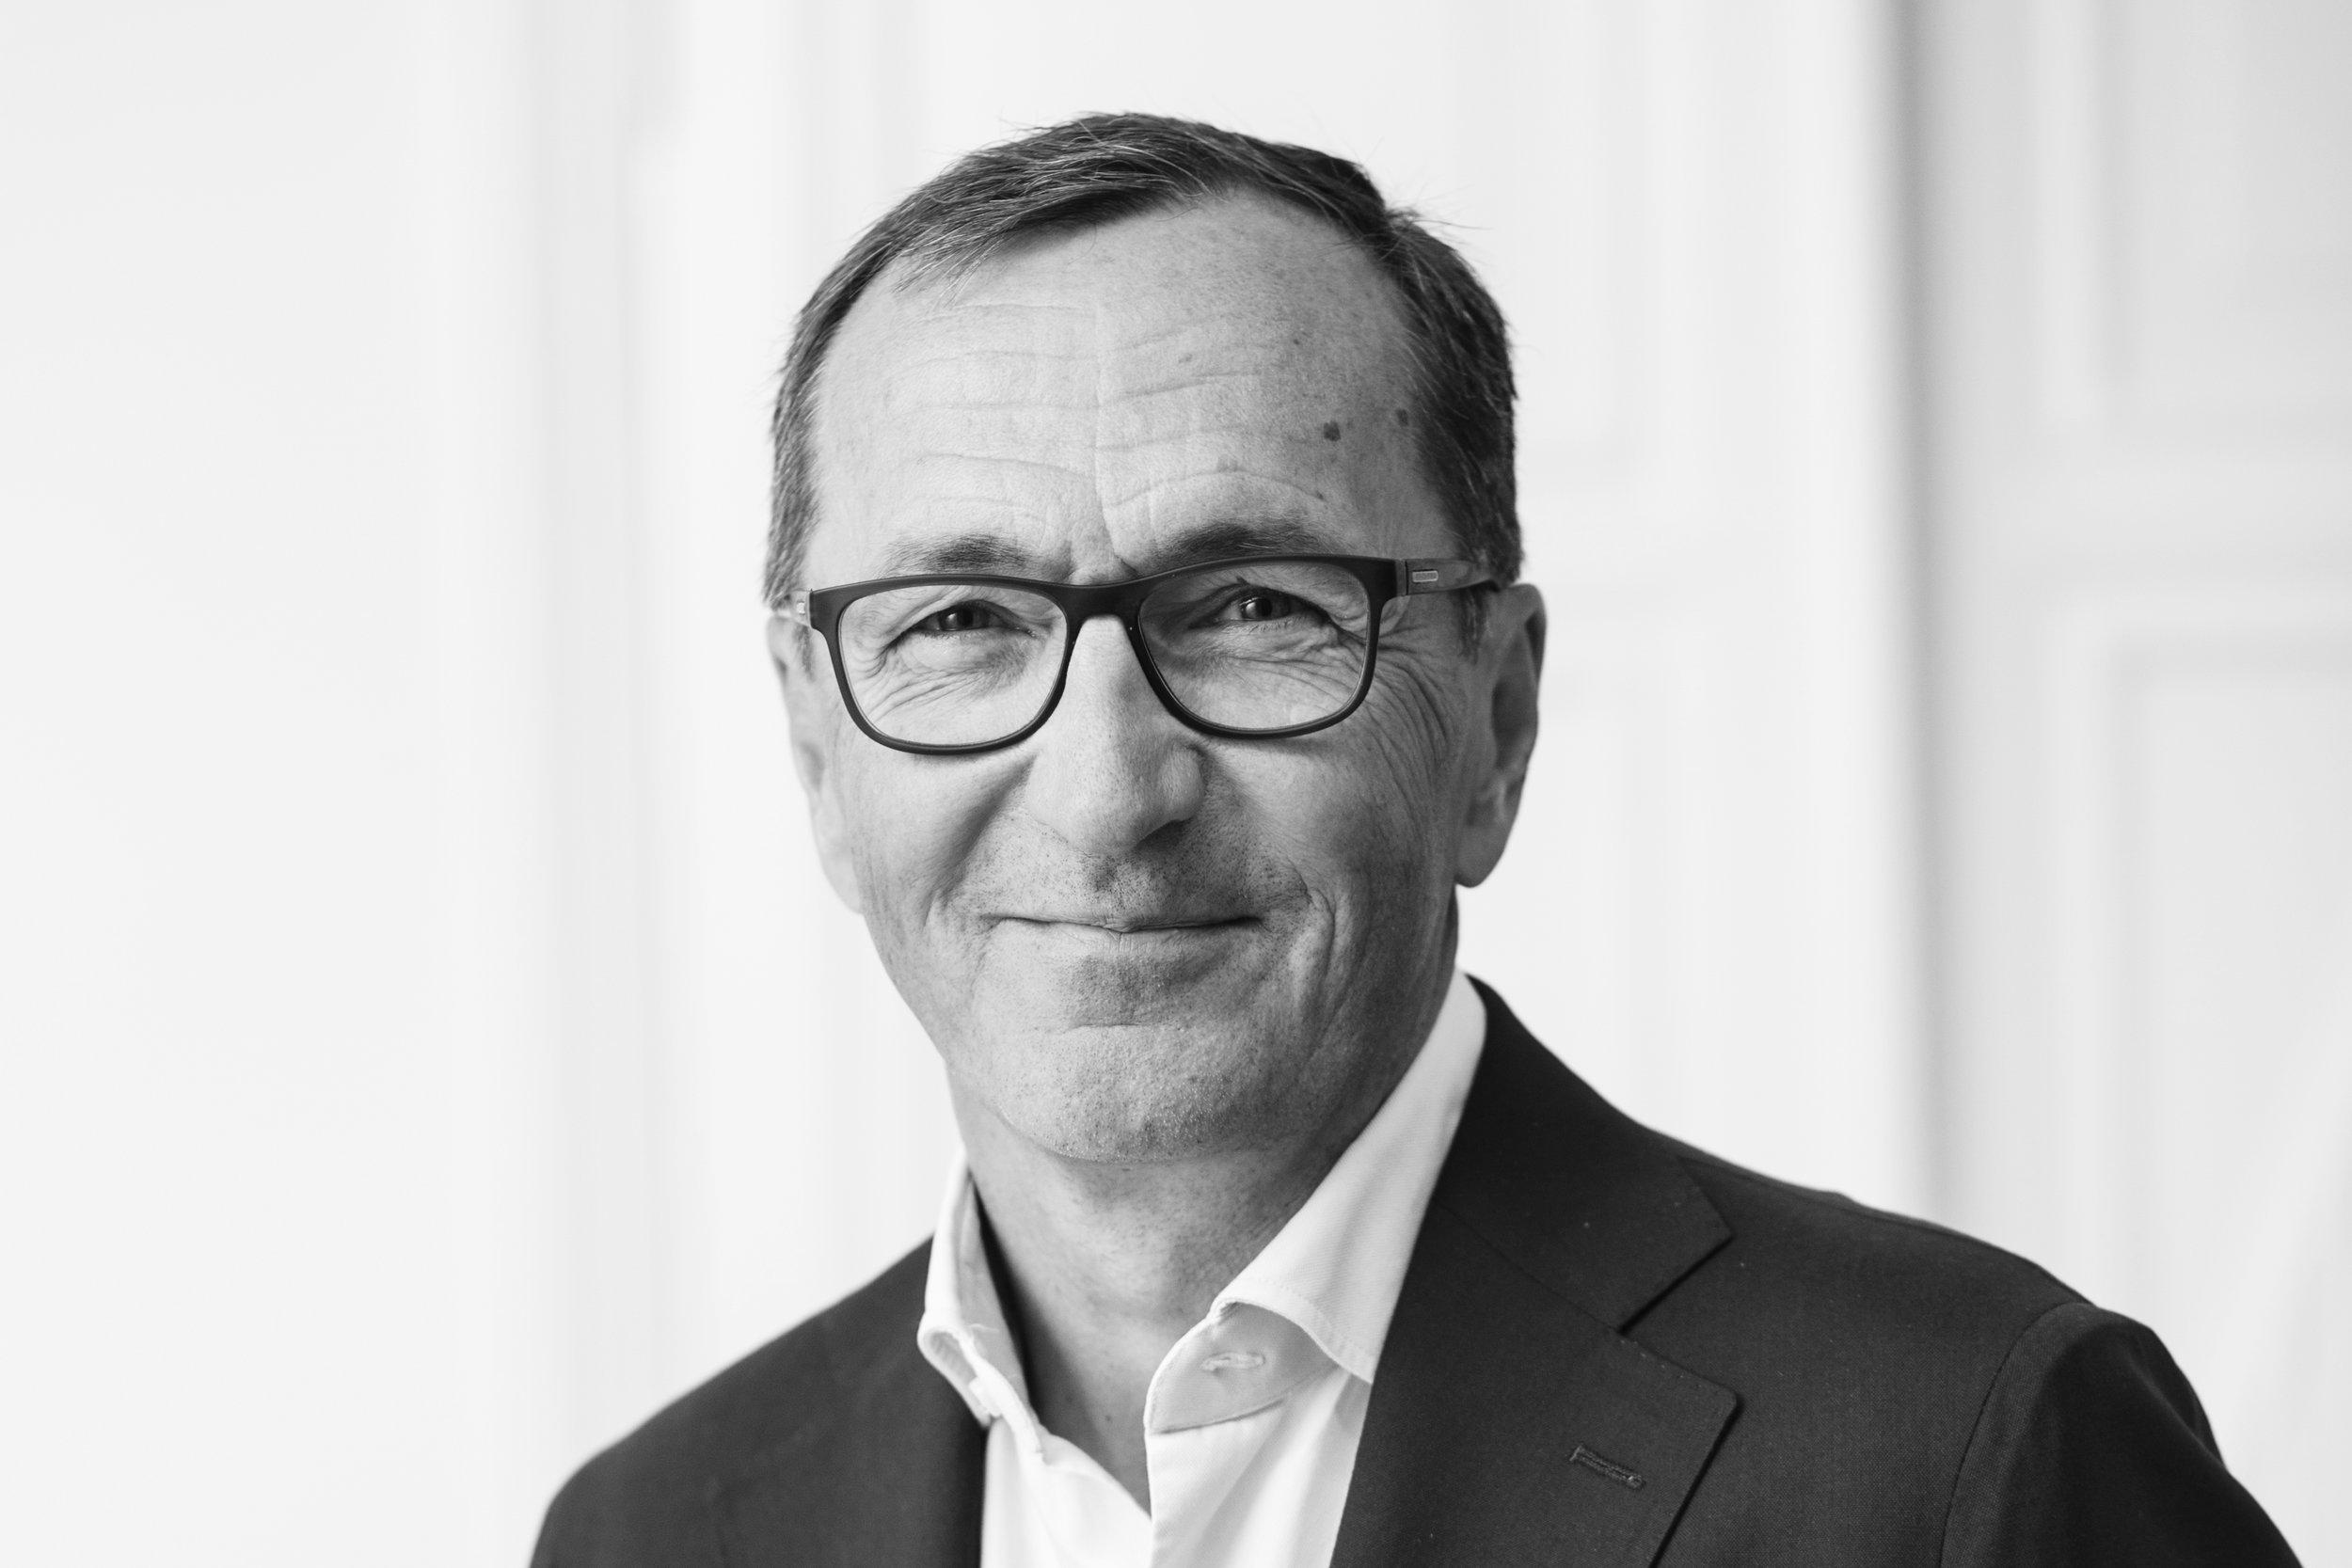 KARI PEUHKURI - CEO Finland and PartnerExtensive international experience in executive search. Previous roles at JFP Executive Search Oy, and Mercuri Urval. Read more →+358 405 03 49 88kari.peuhkuri@nordicinterim.fi